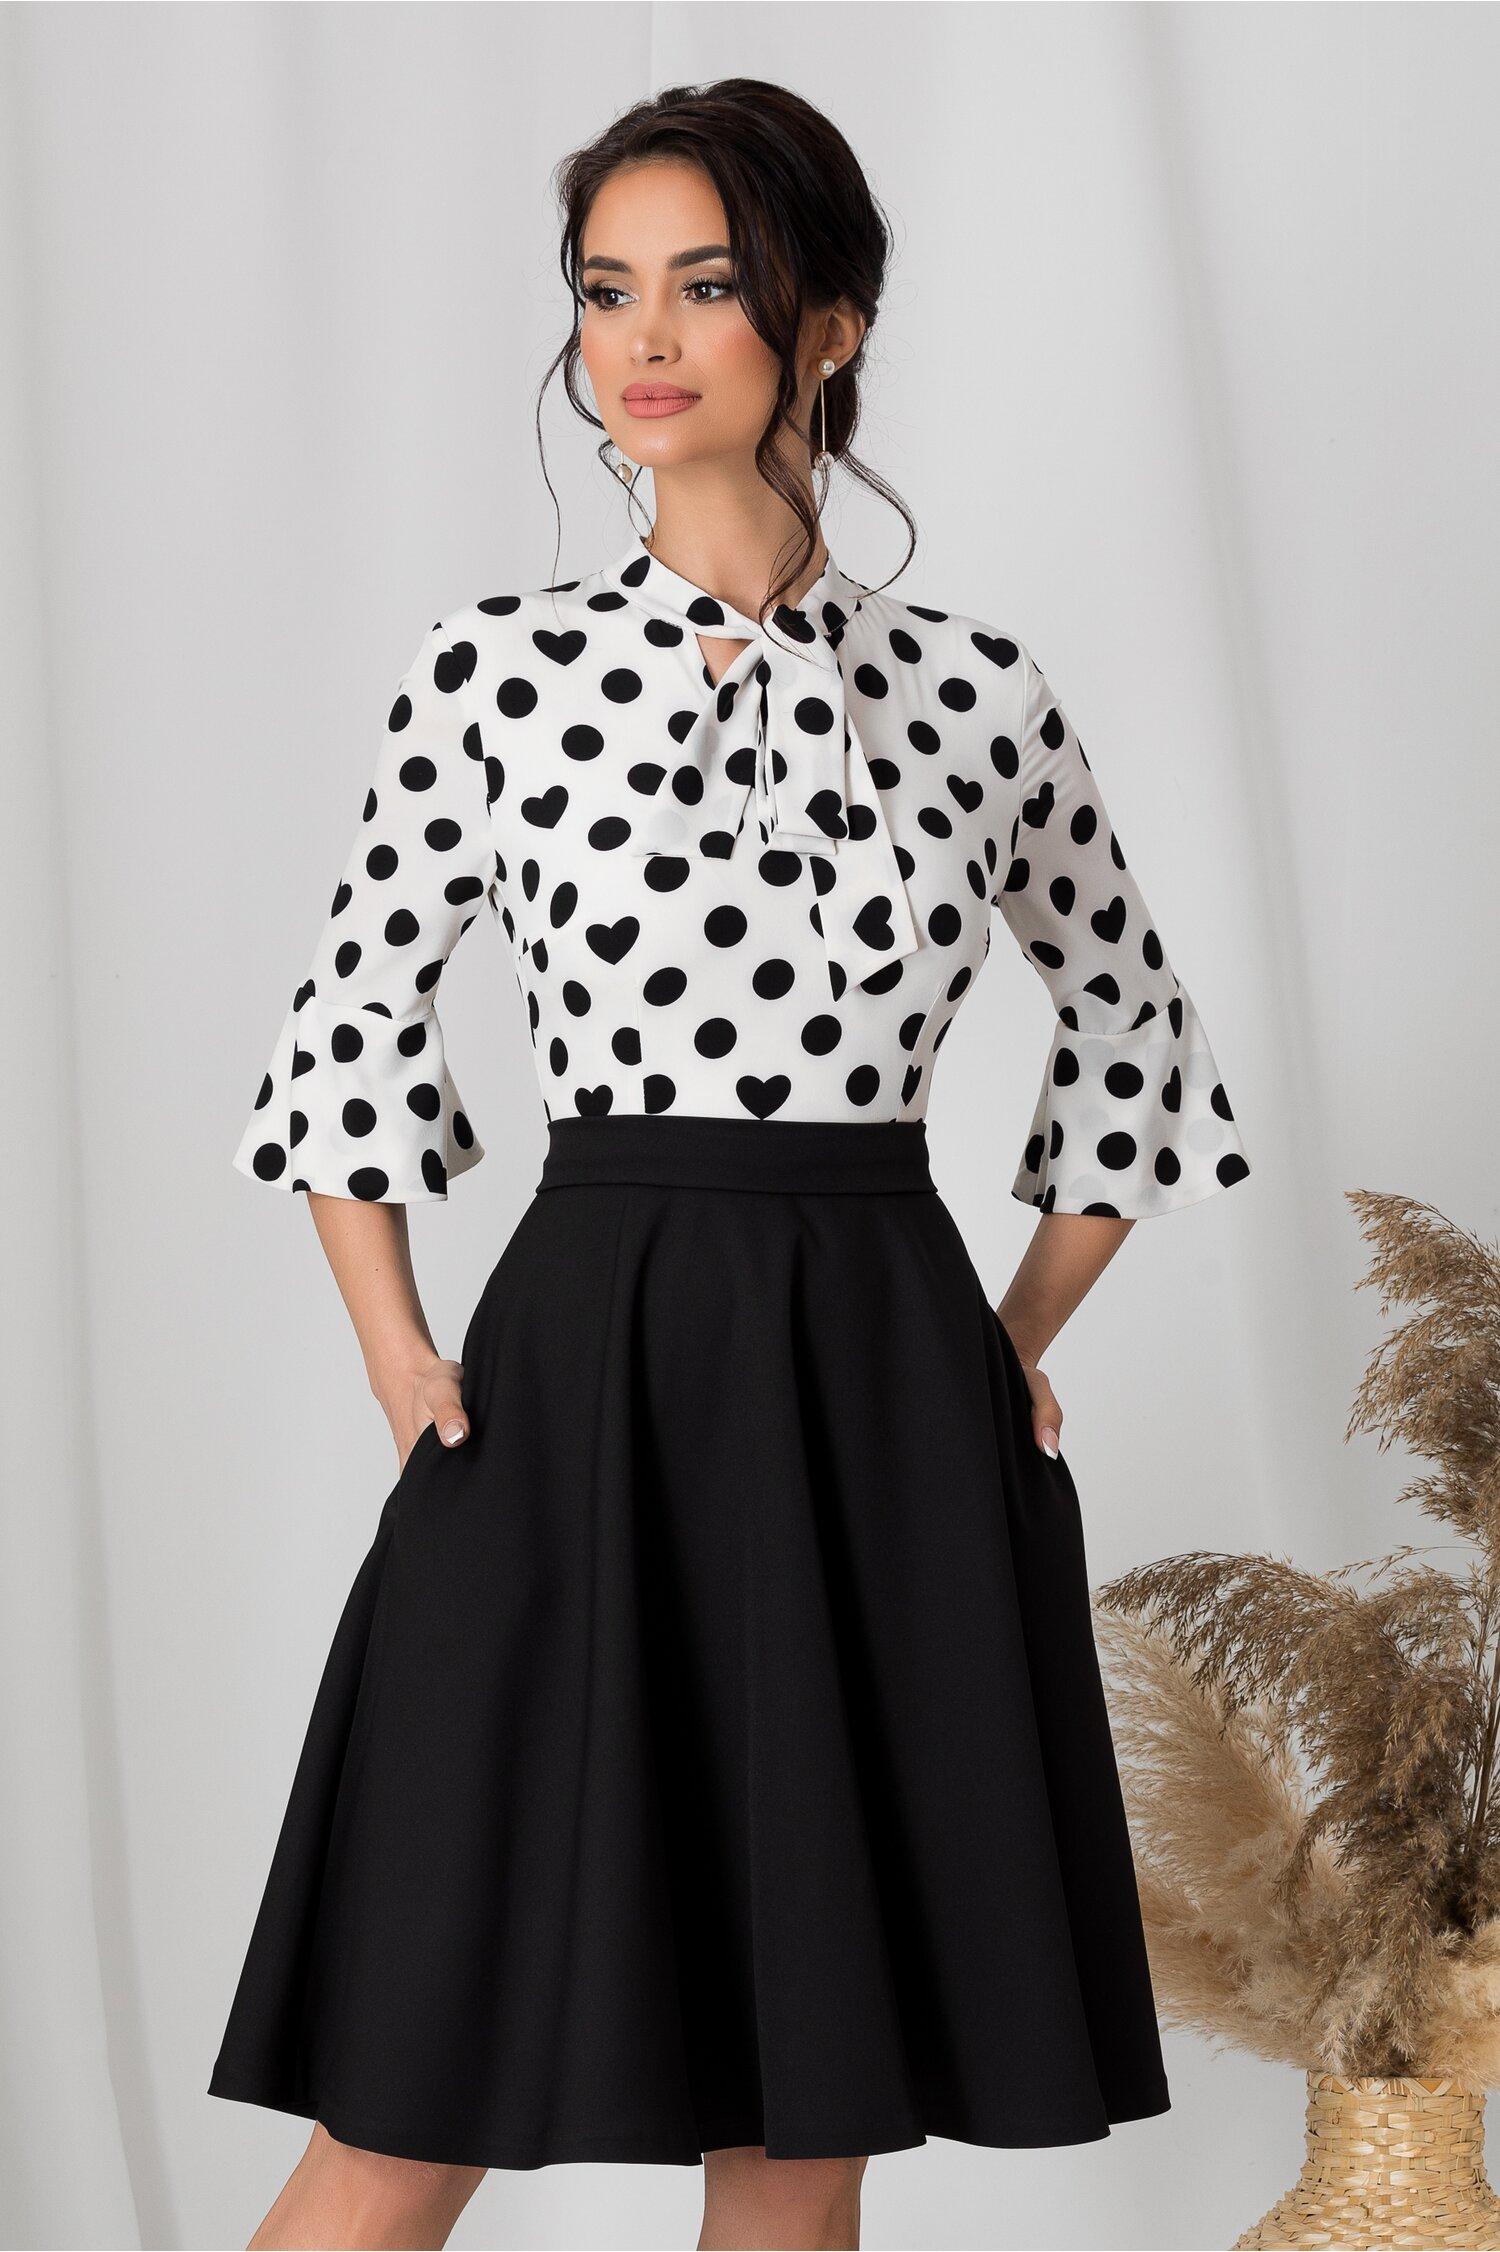 Rochie MBG cu fusta neagra si bluza alba cu buline imagine dyfashion.ro 2021